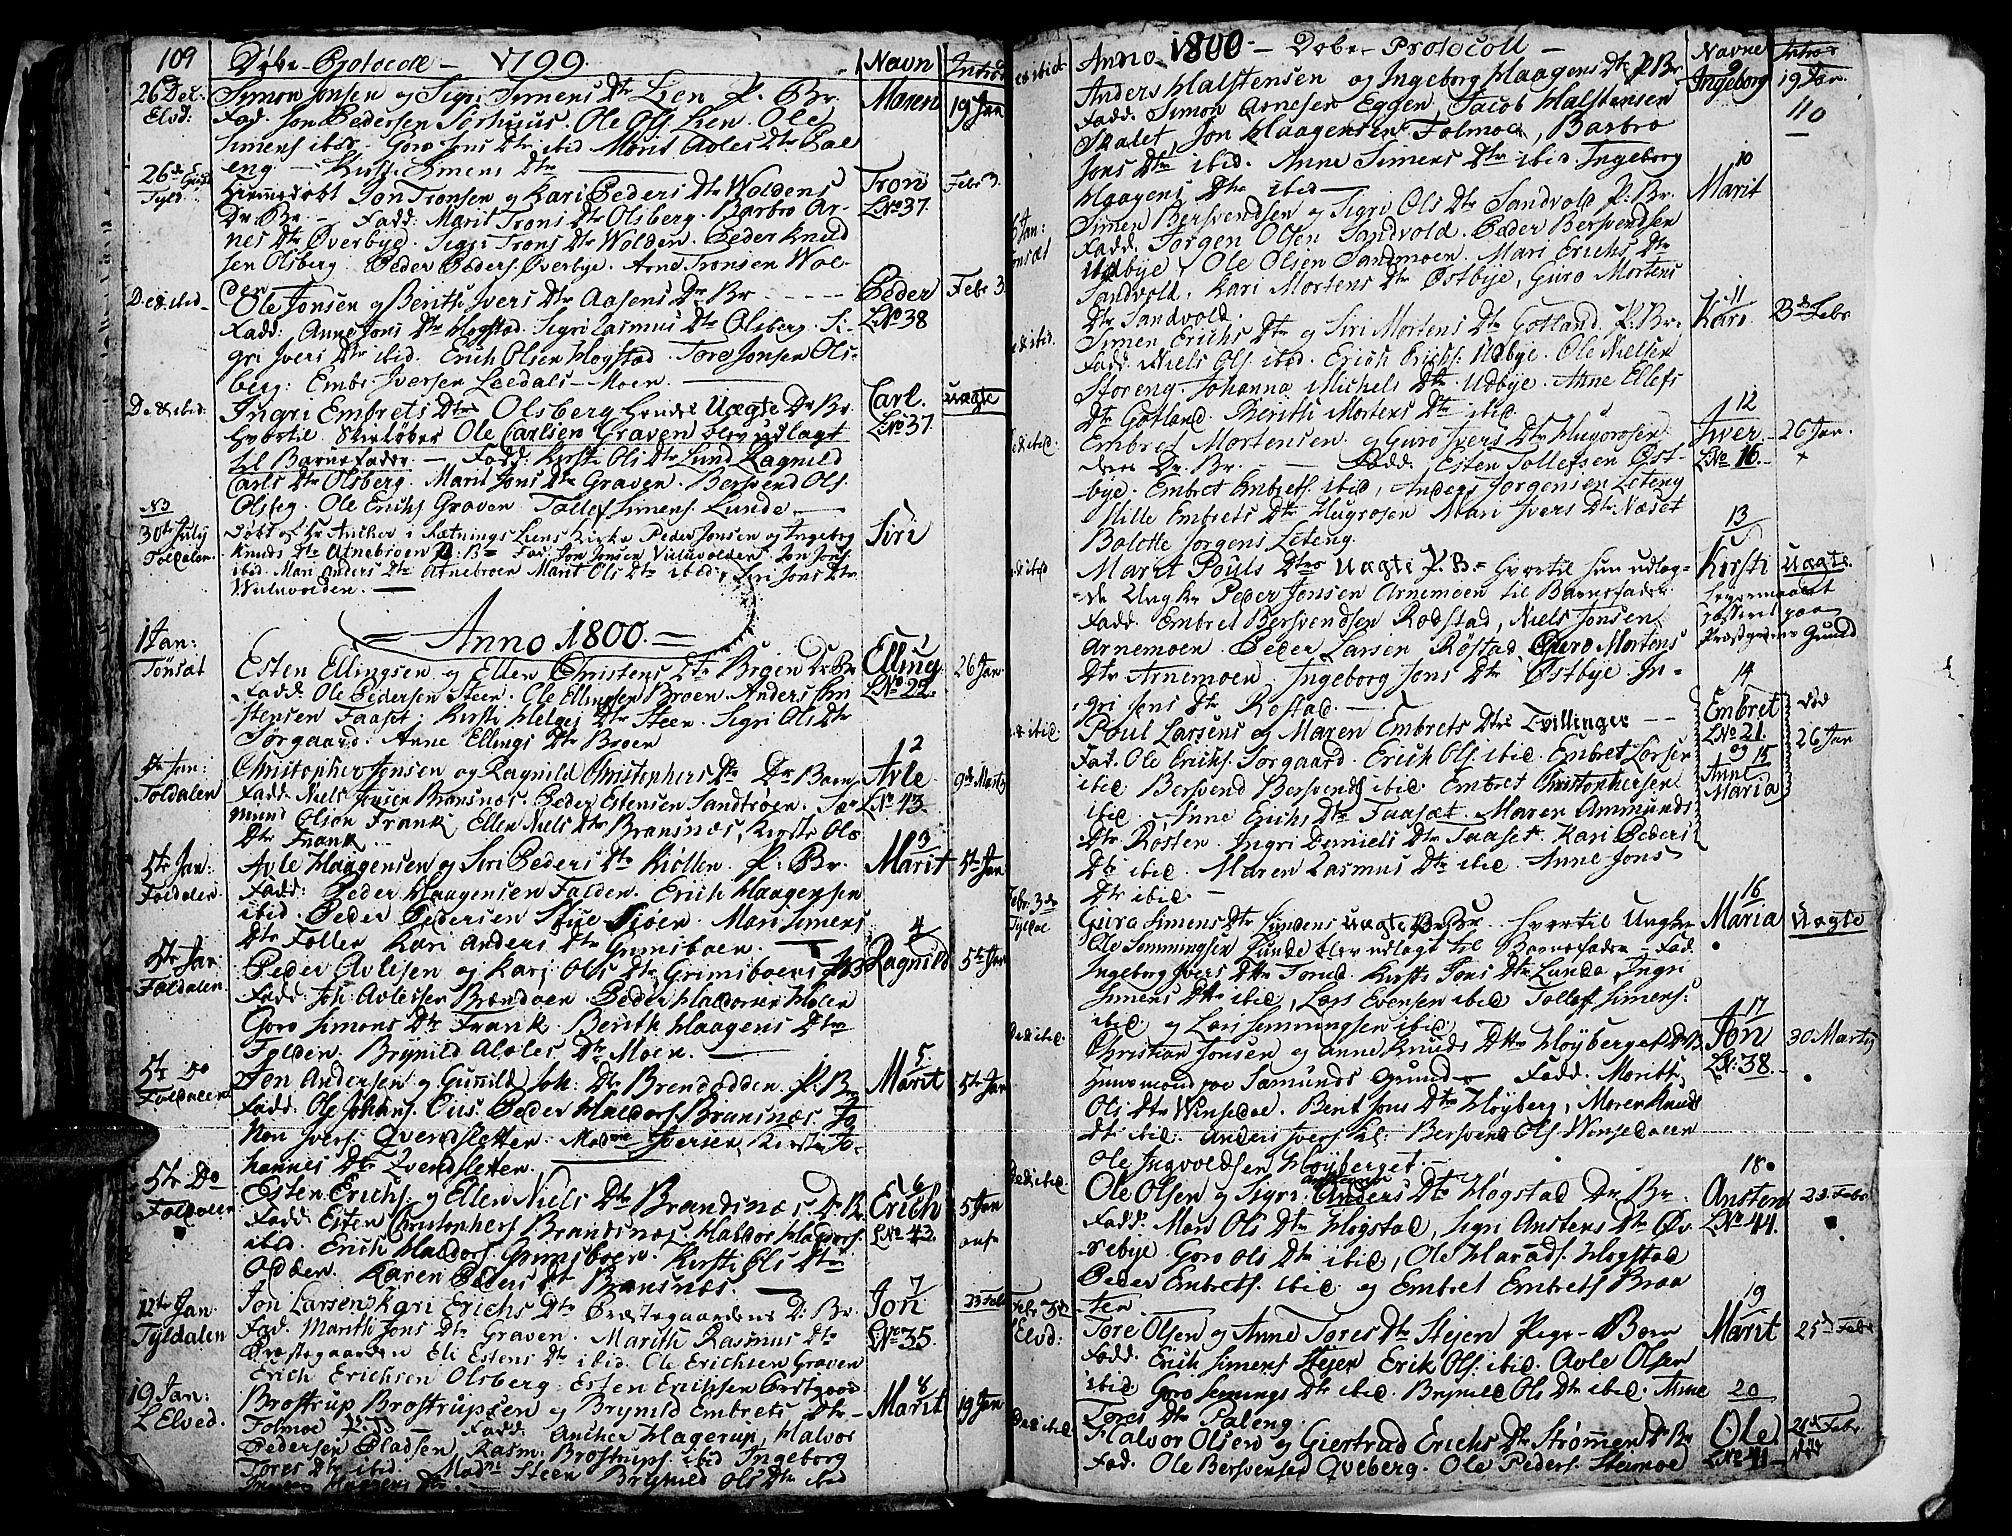 SAH, Tynset prestekontor, Ministerialbok nr. 14, 1790-1800, s. 109-110